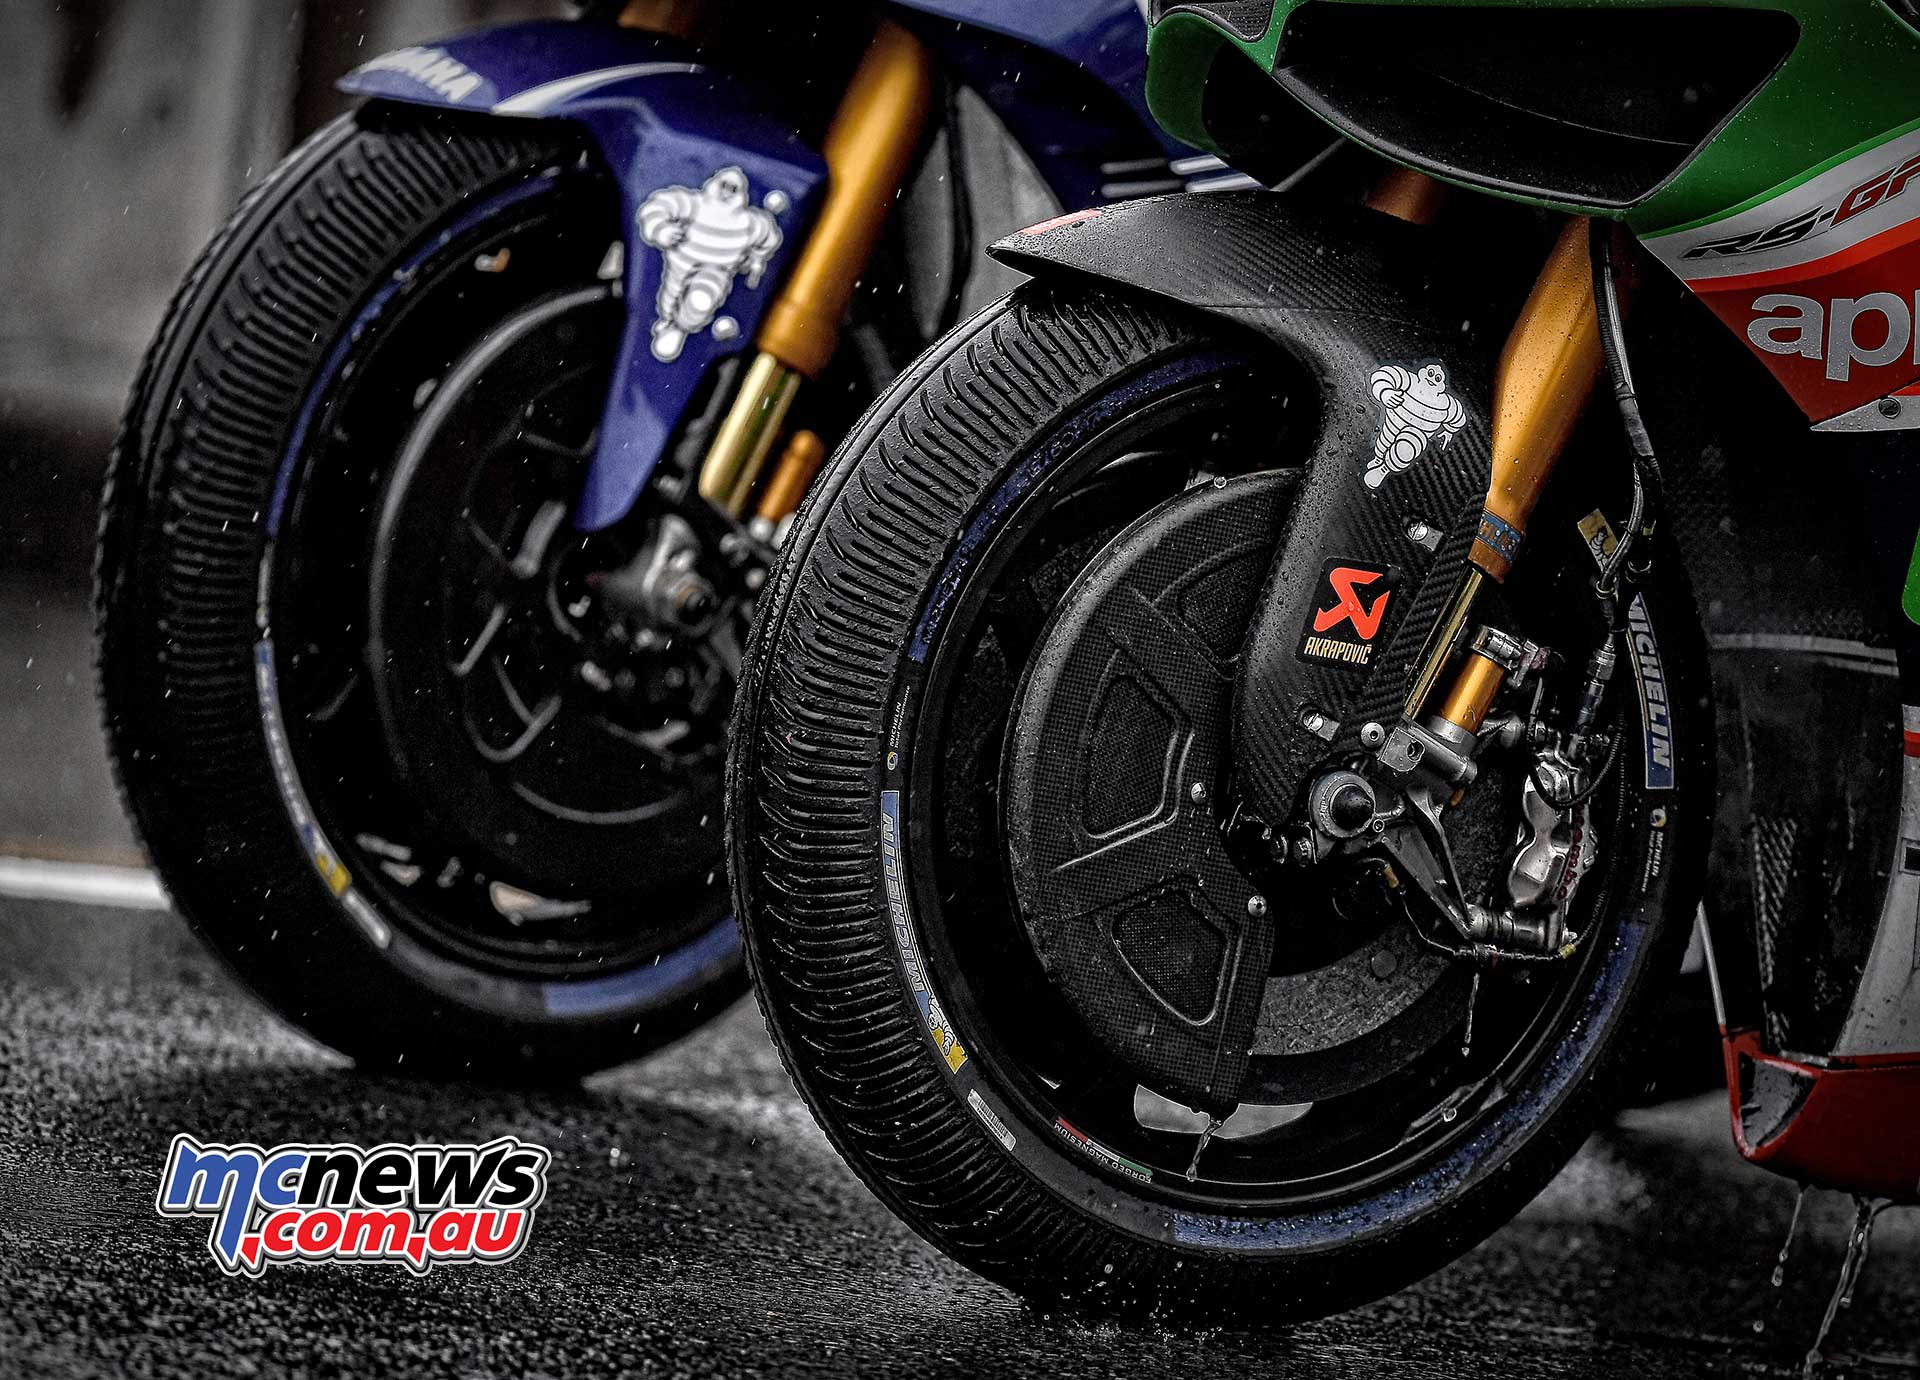 MotoGP 2017 - Round 15 - Motegi - Michelin